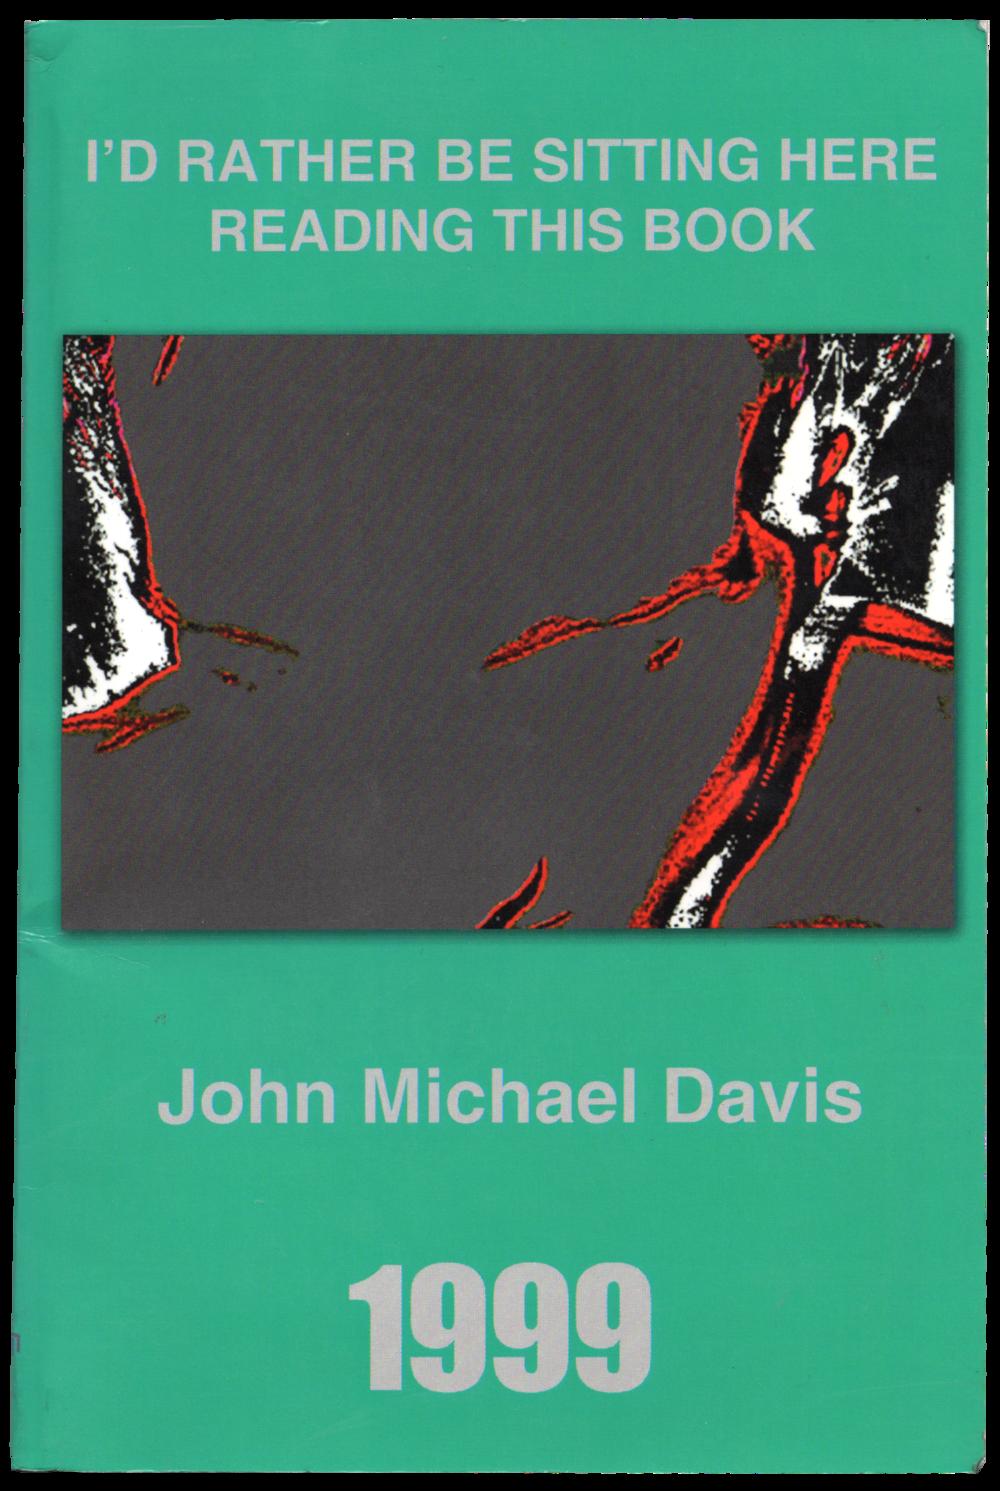 WLWLTDOO-2004-EPHEMERA-BOOK-JOHN_MICHAEL_DAVIS-COVER.png